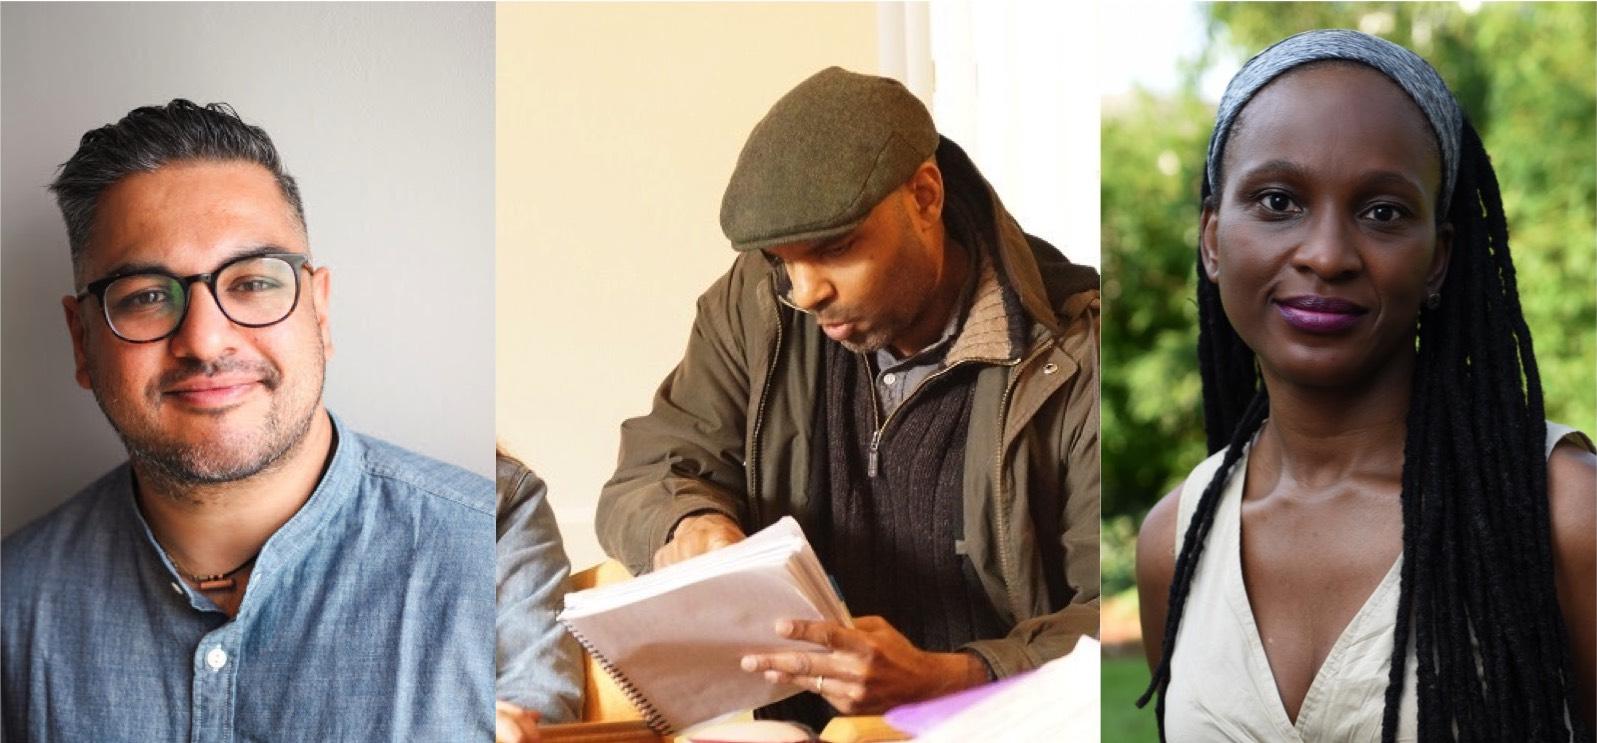 Photos of Nikesh Shukla, Tes Noah Asfaw and Chika Unigwe